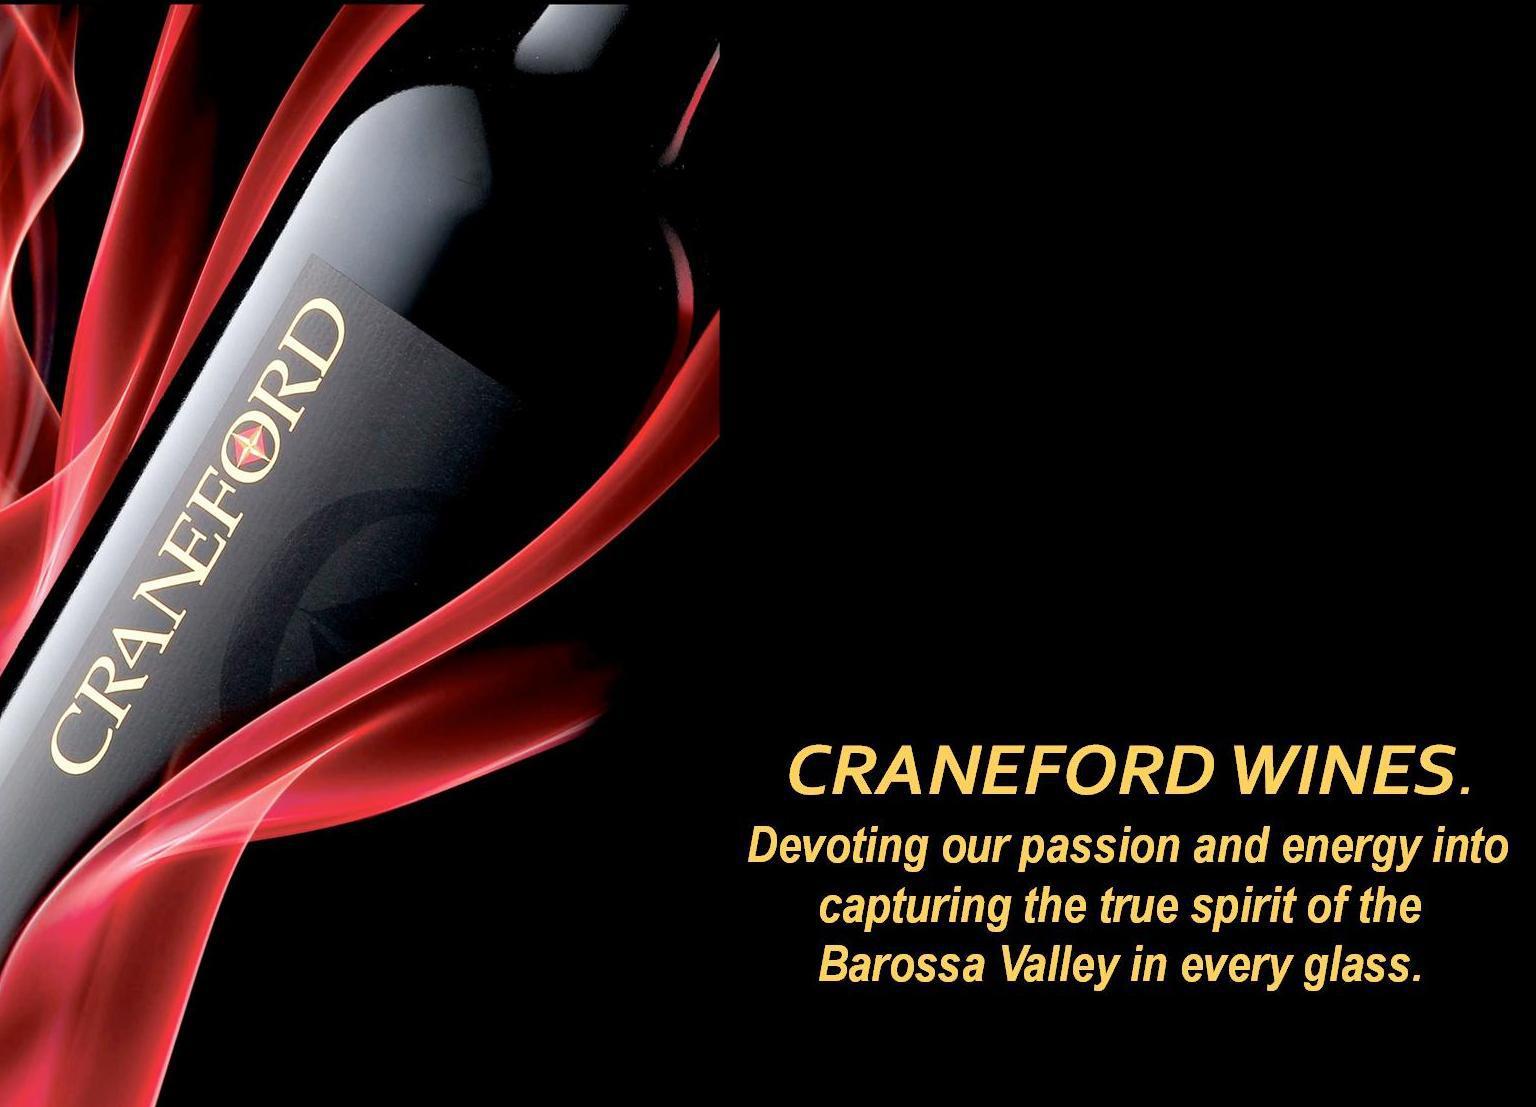 Craneford